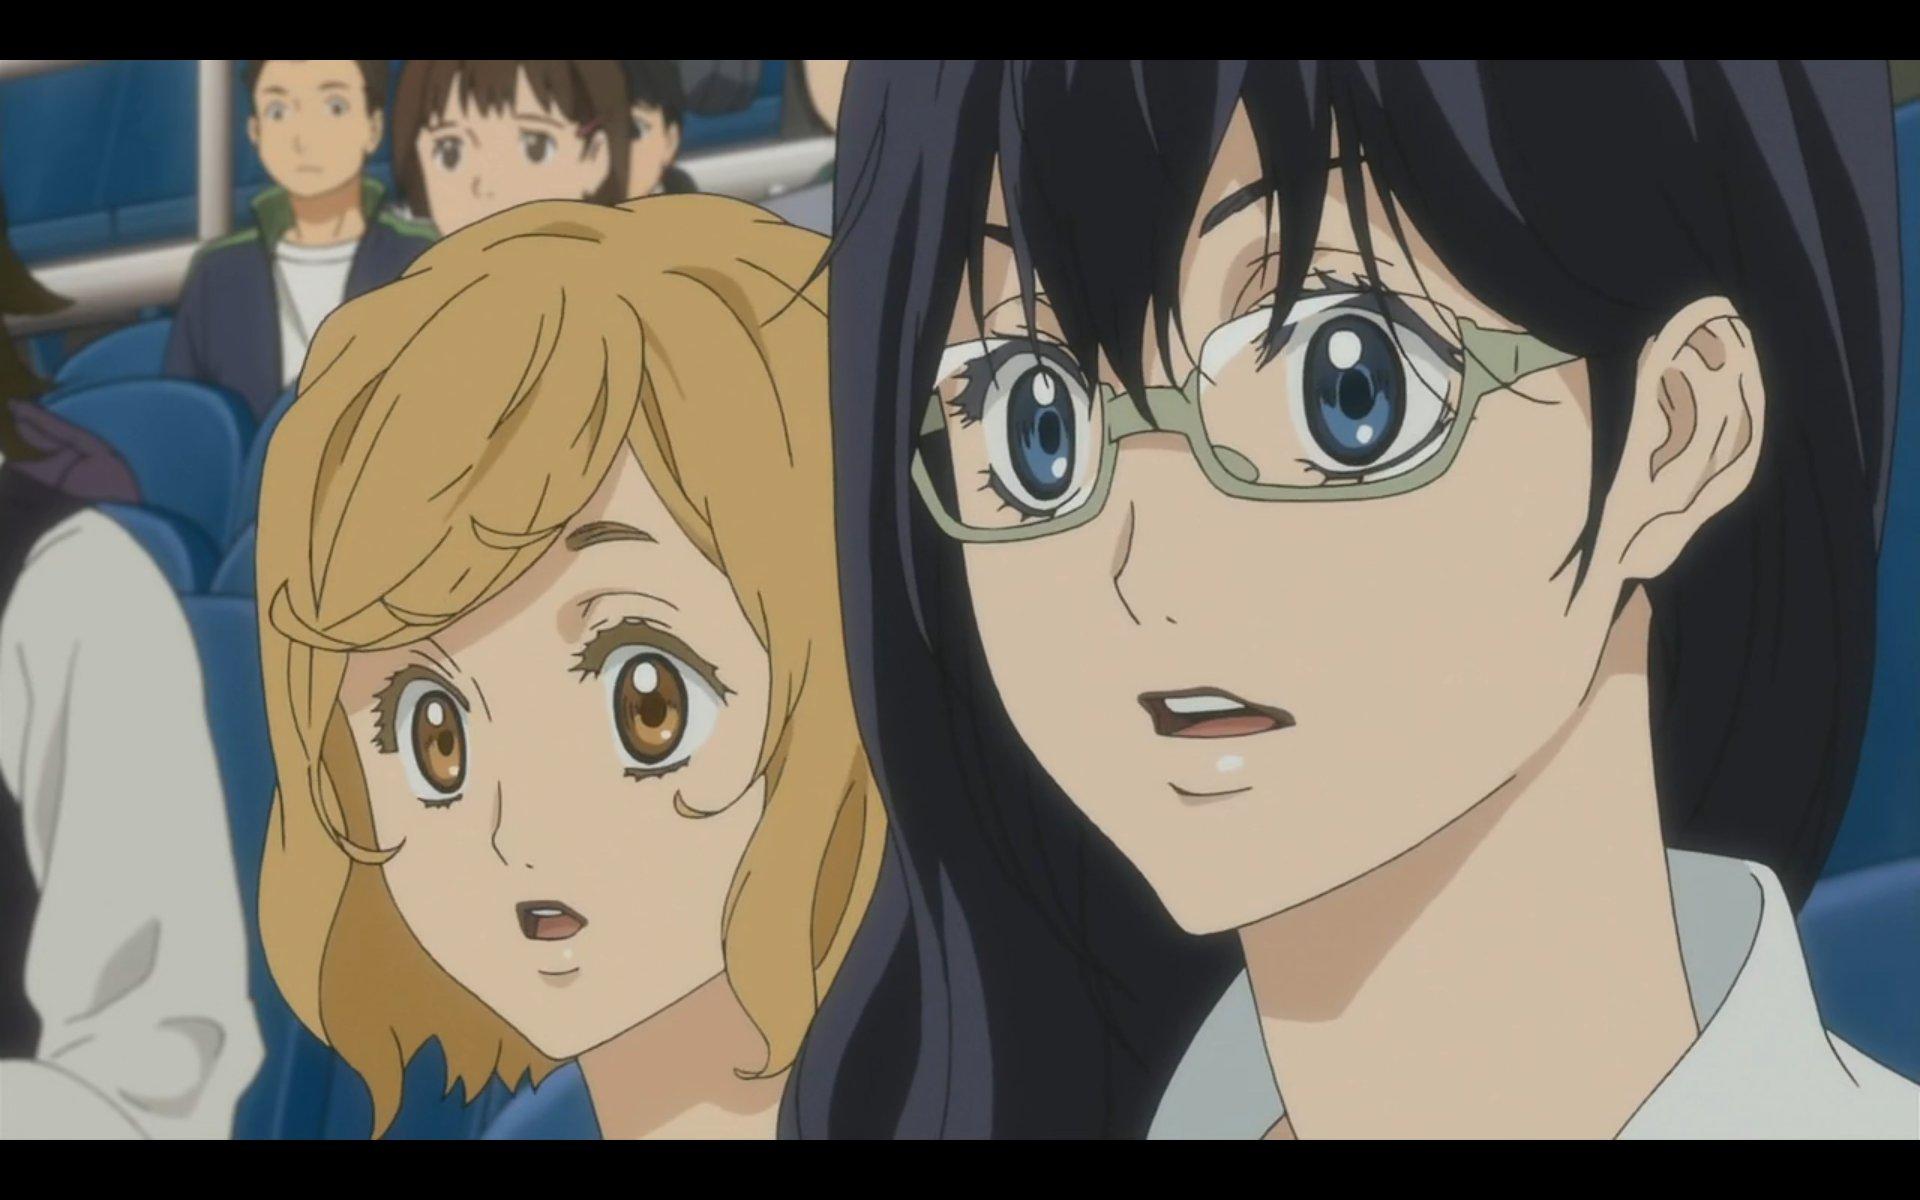 Special | TVアニメ「ボールルームへようこそ」公式 …